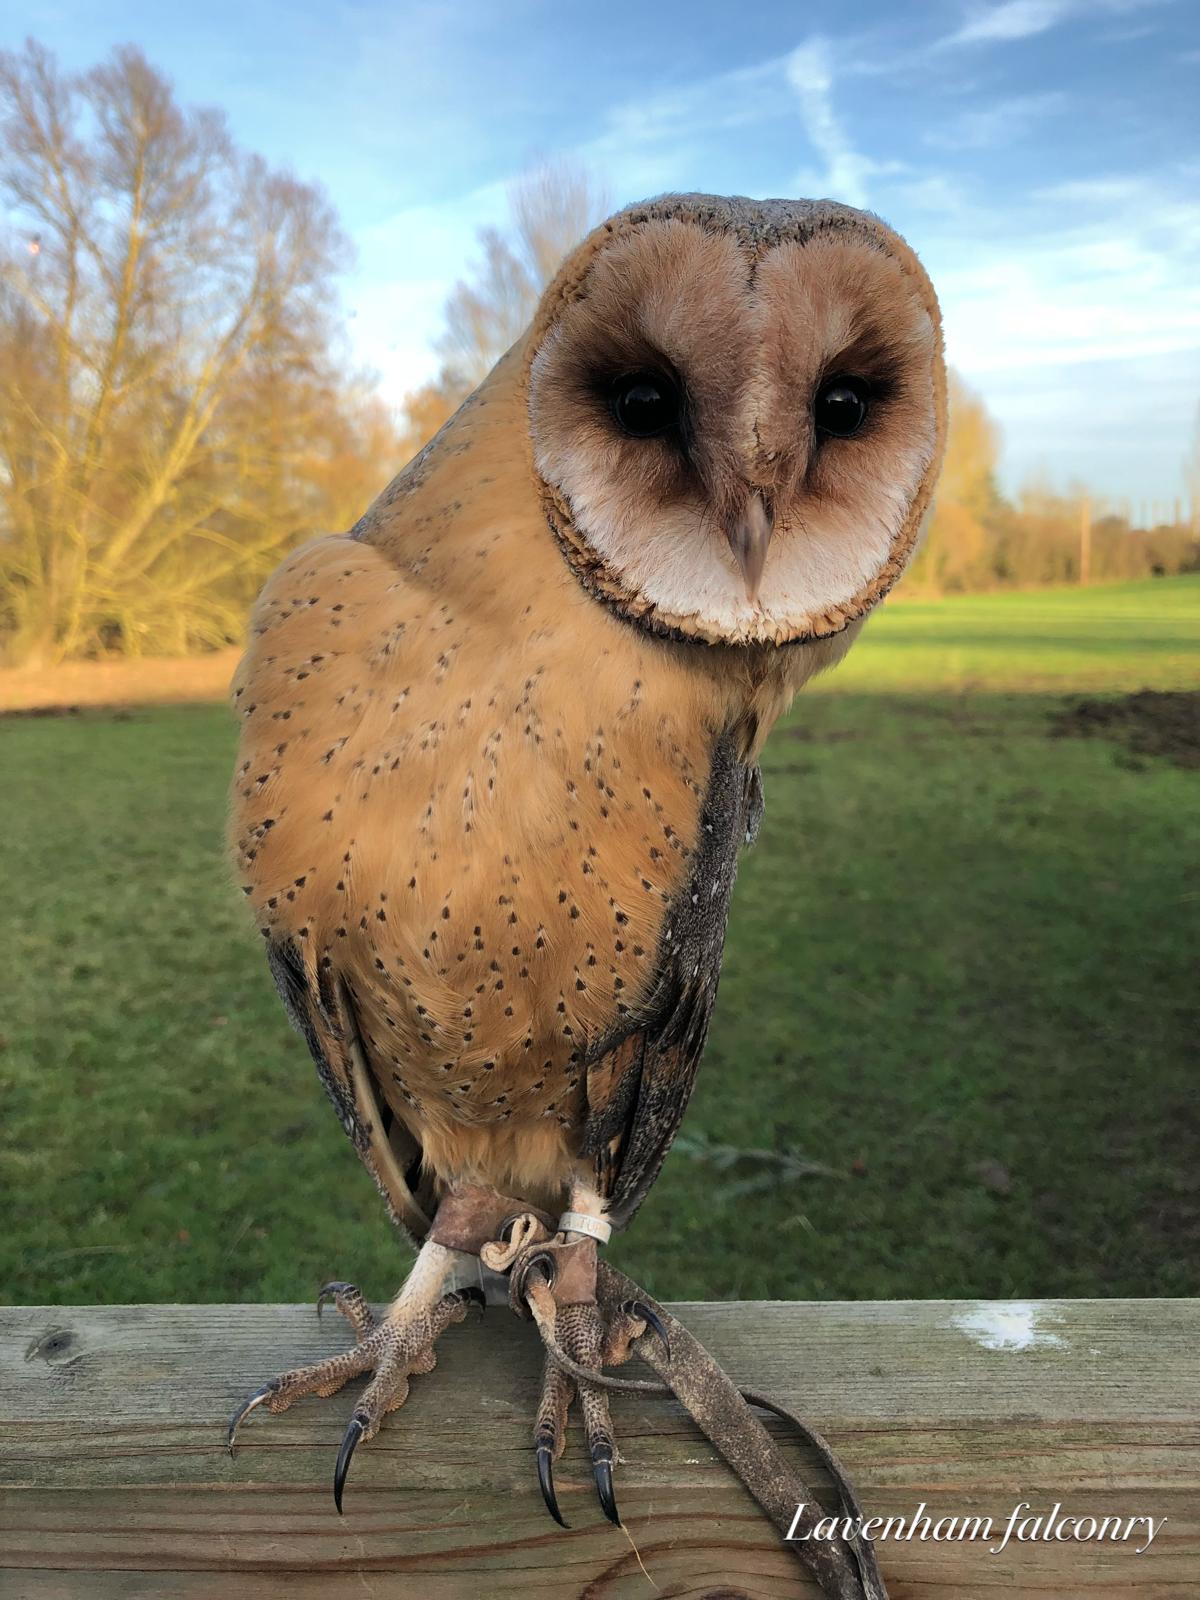 Hector the dark breasted barn owl - Lavenham Falconry